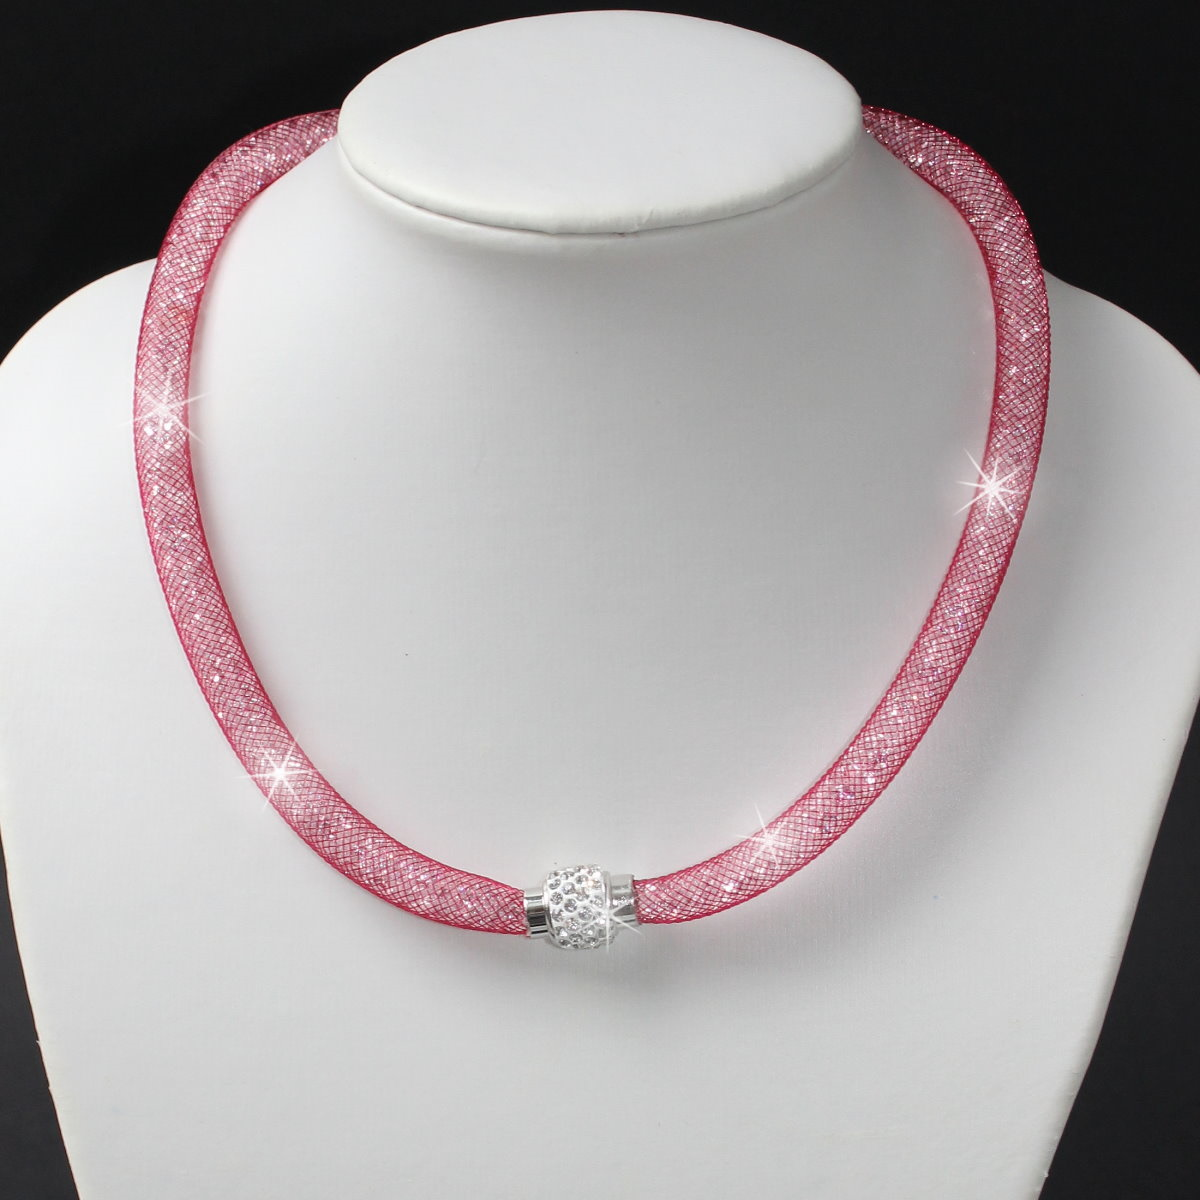 K1053# Collier Nylonnetzschlauch Kristalle Shamballa heide